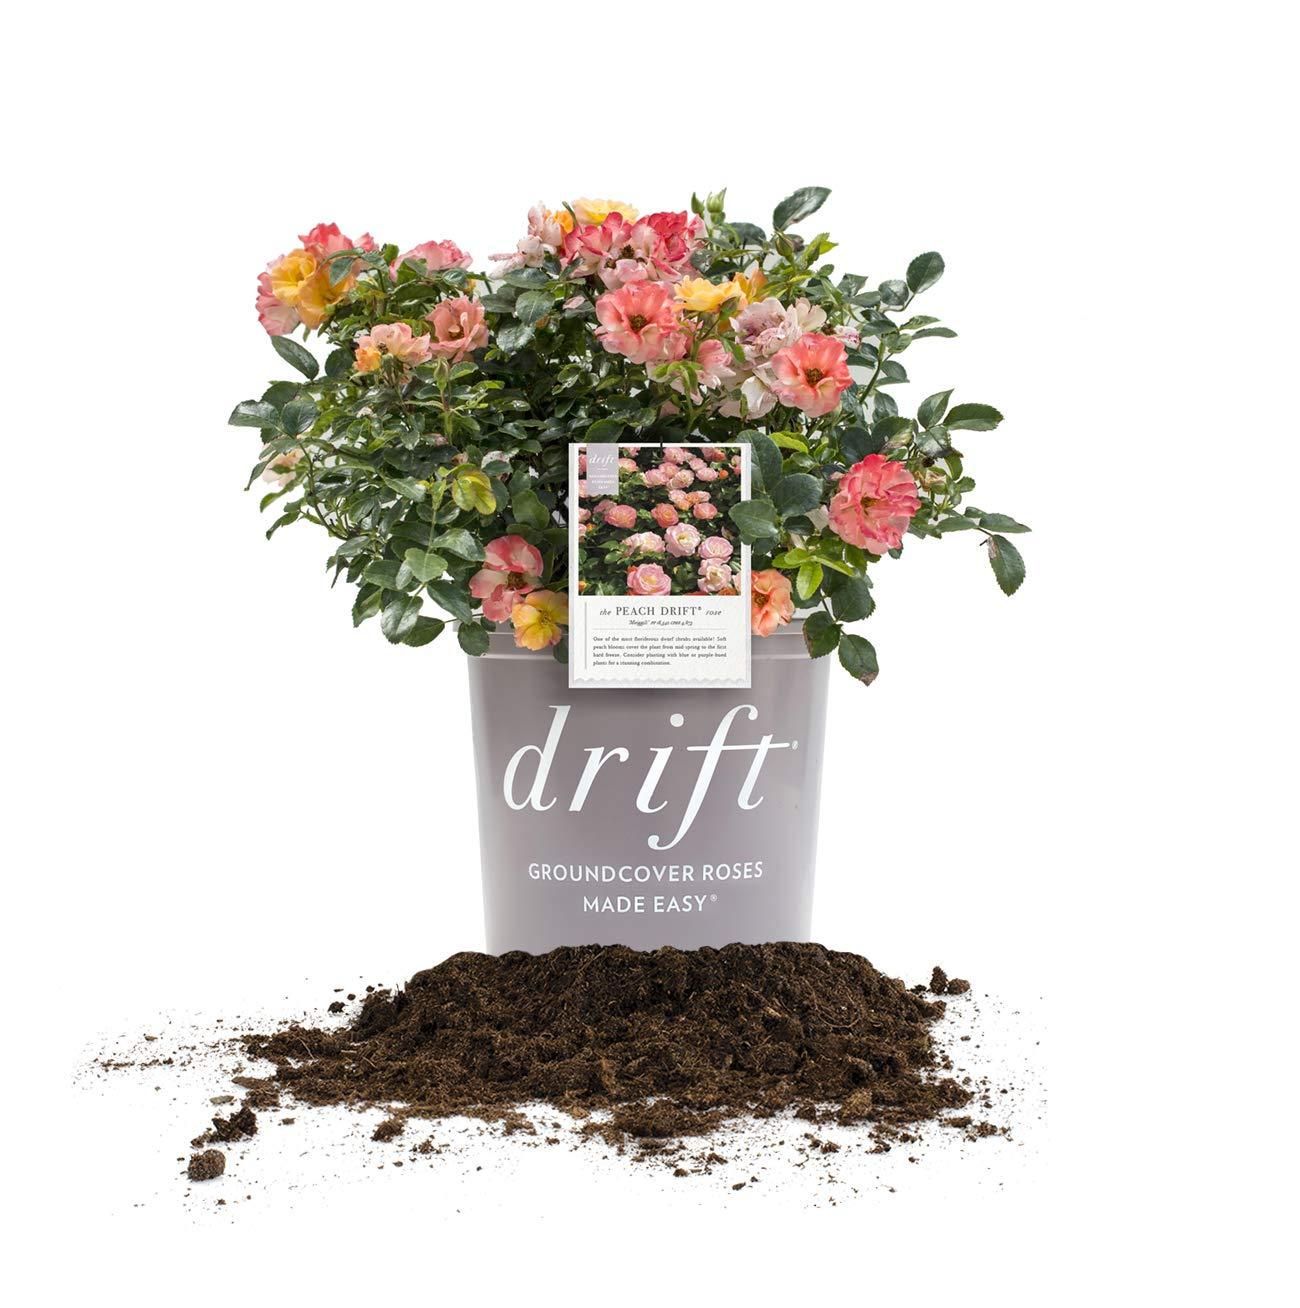 Perfect Plants Peach Drift Rose Live Plant, 3 Gallon, Includes Care Guide